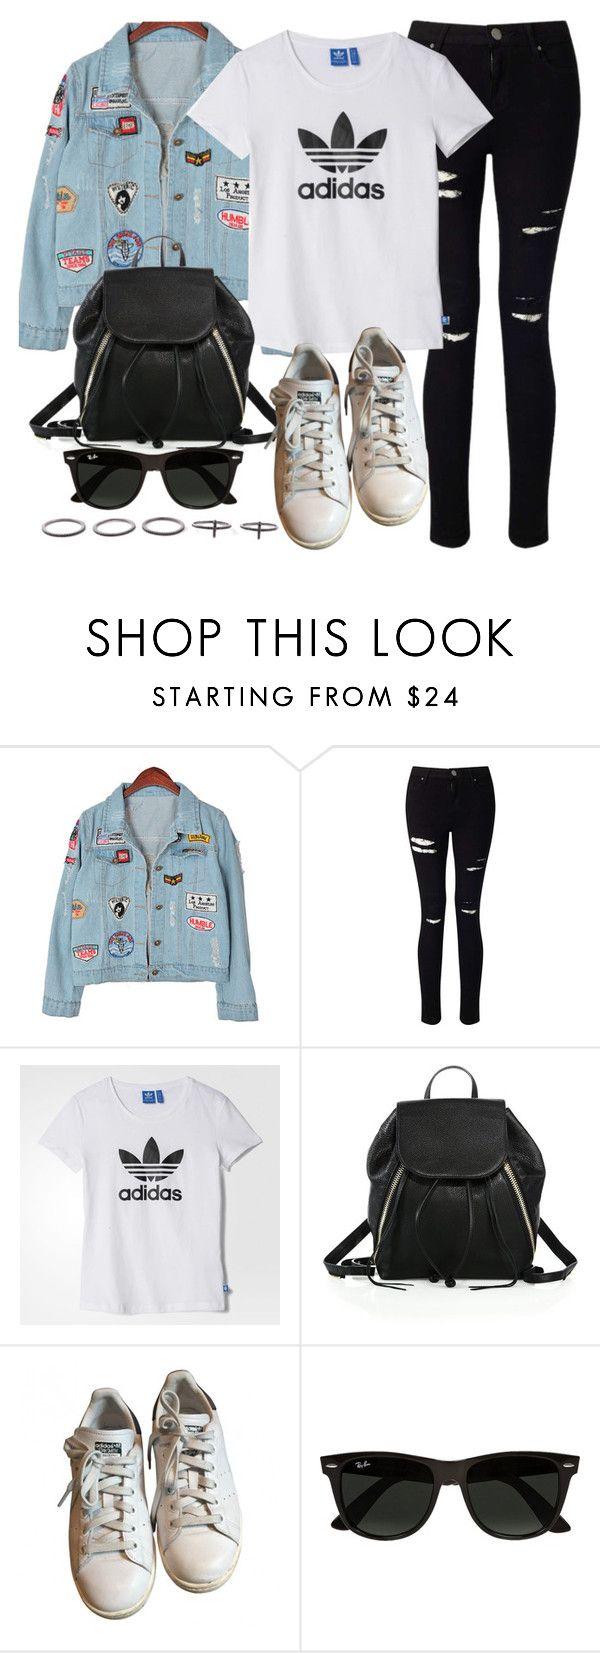 """Style #11051"" by vany-alvarado ❤ liked on Polyvore featuring Chicnova Fashion, Miss Selfridge, adidas, Rebecca Minkoff, Ray-Ban and Luxury Fashion"